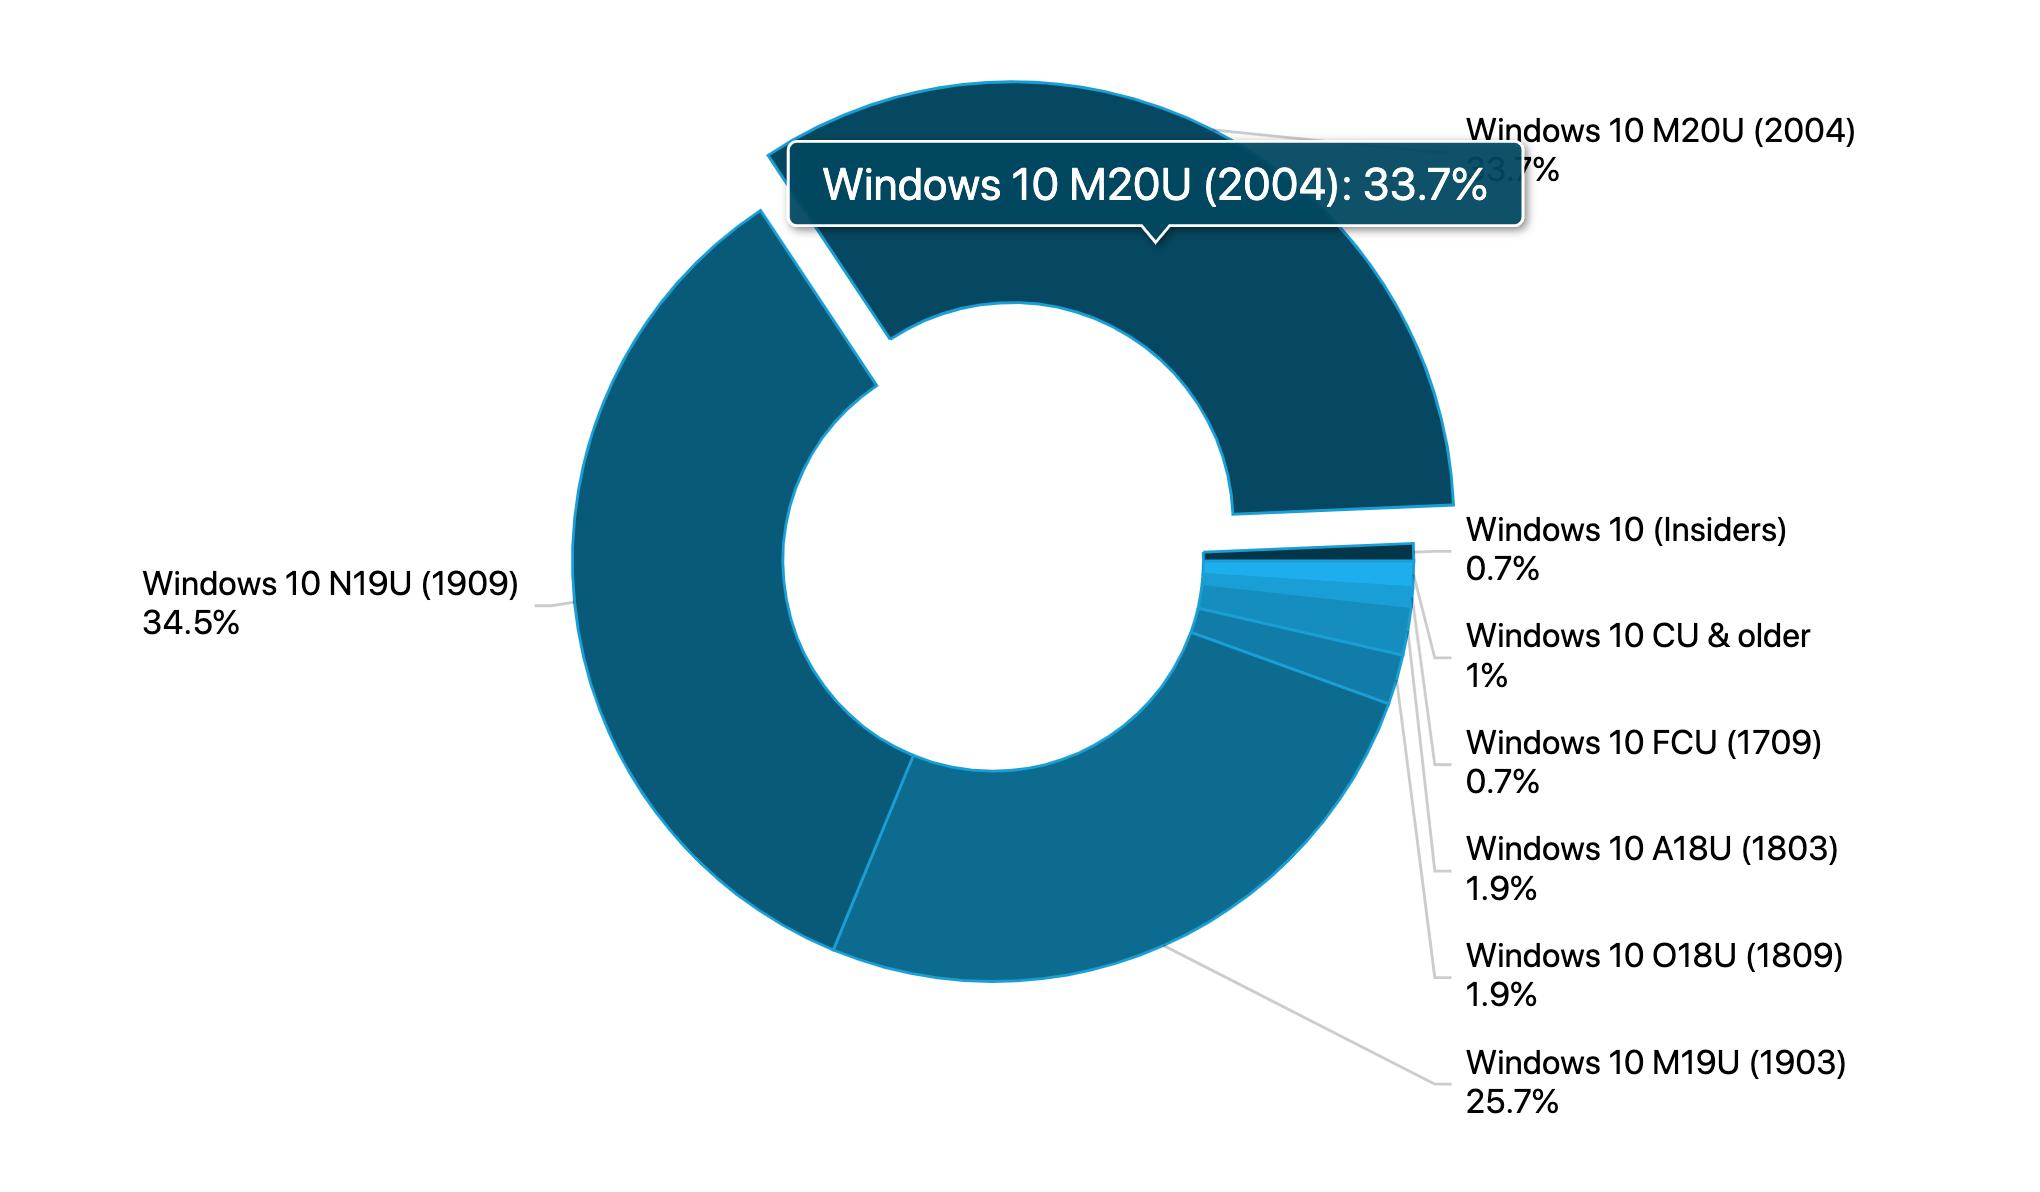 windows 10 2004 usage